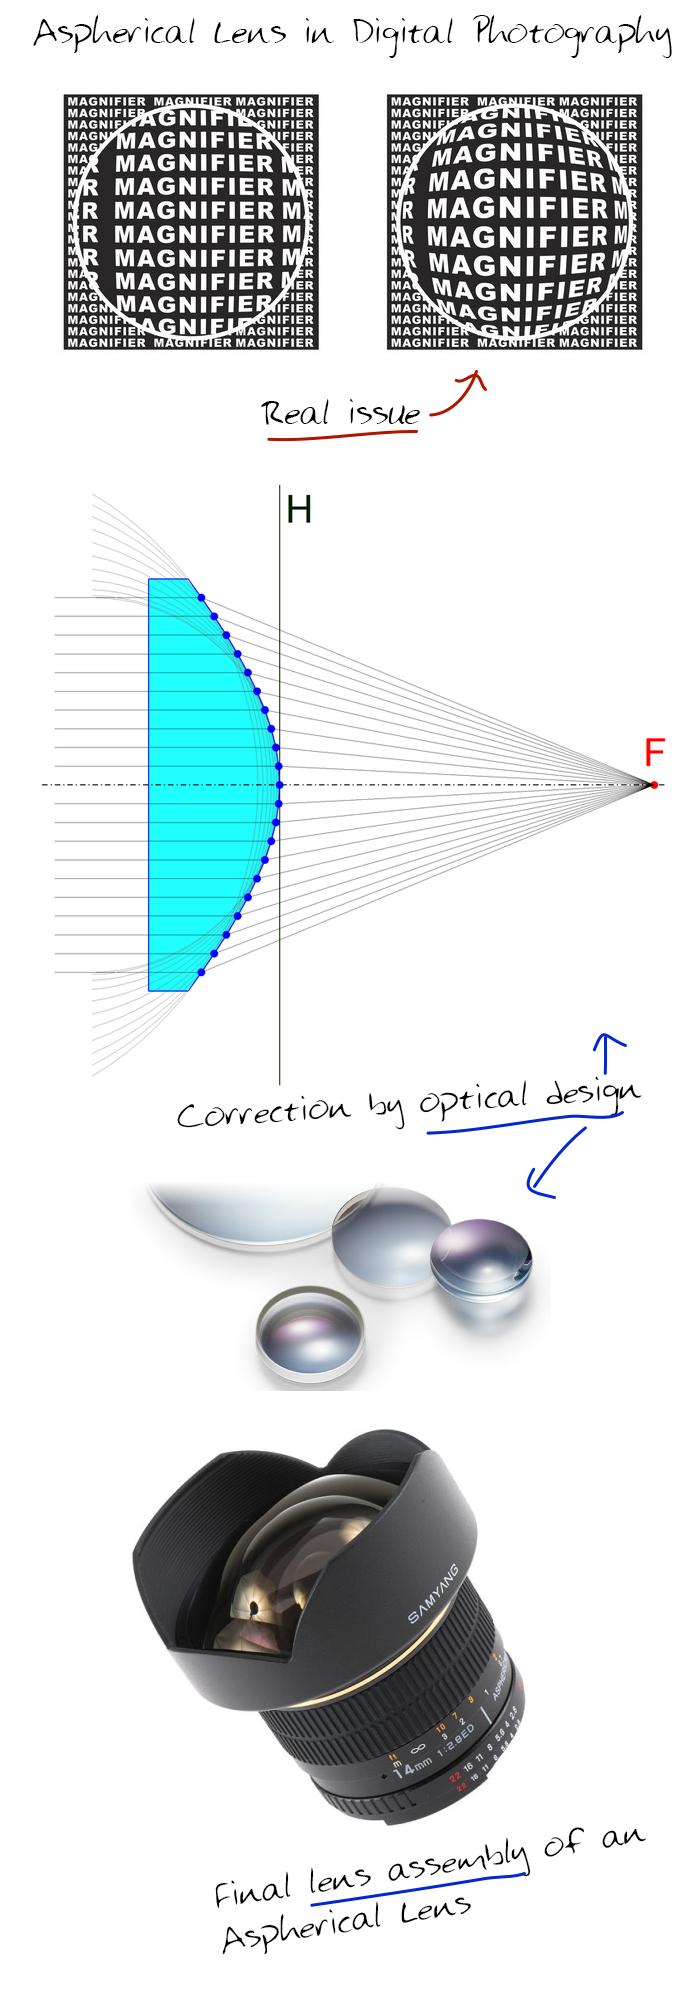 Aspherical-Lens-in-Digital-Photography